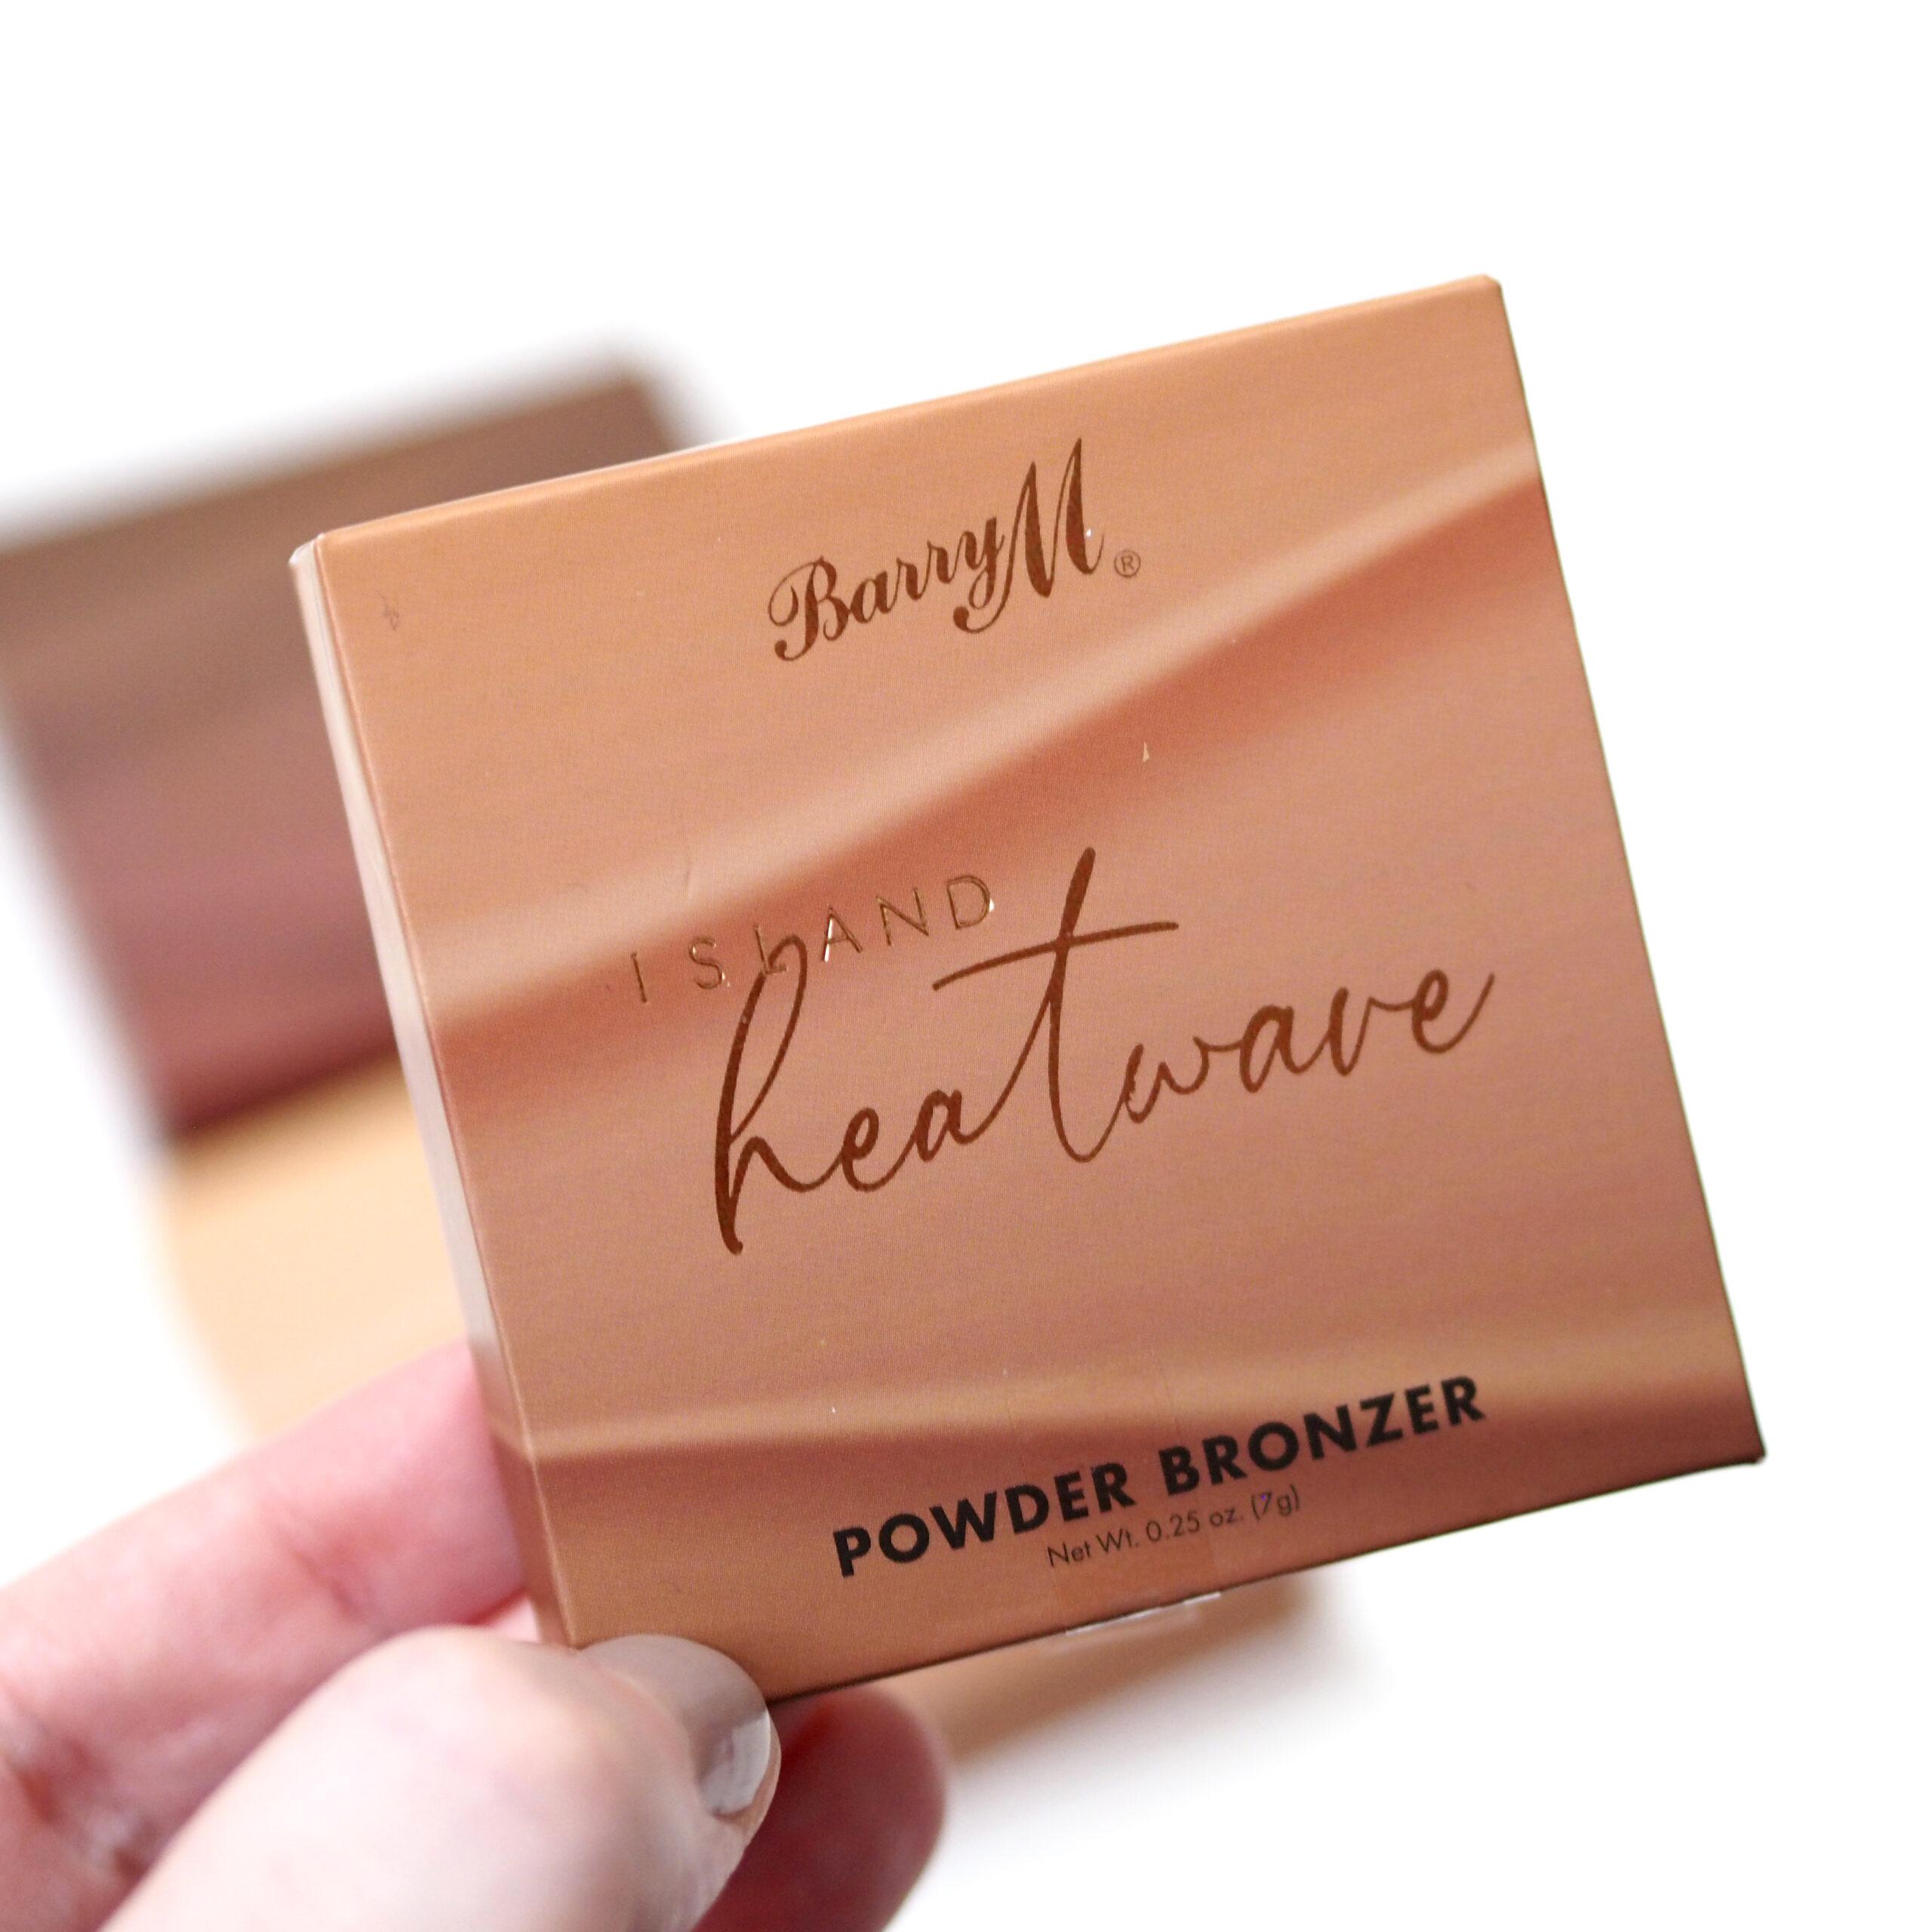 Barry M Heatwave Powder Bronzer Collection Review / Swatches